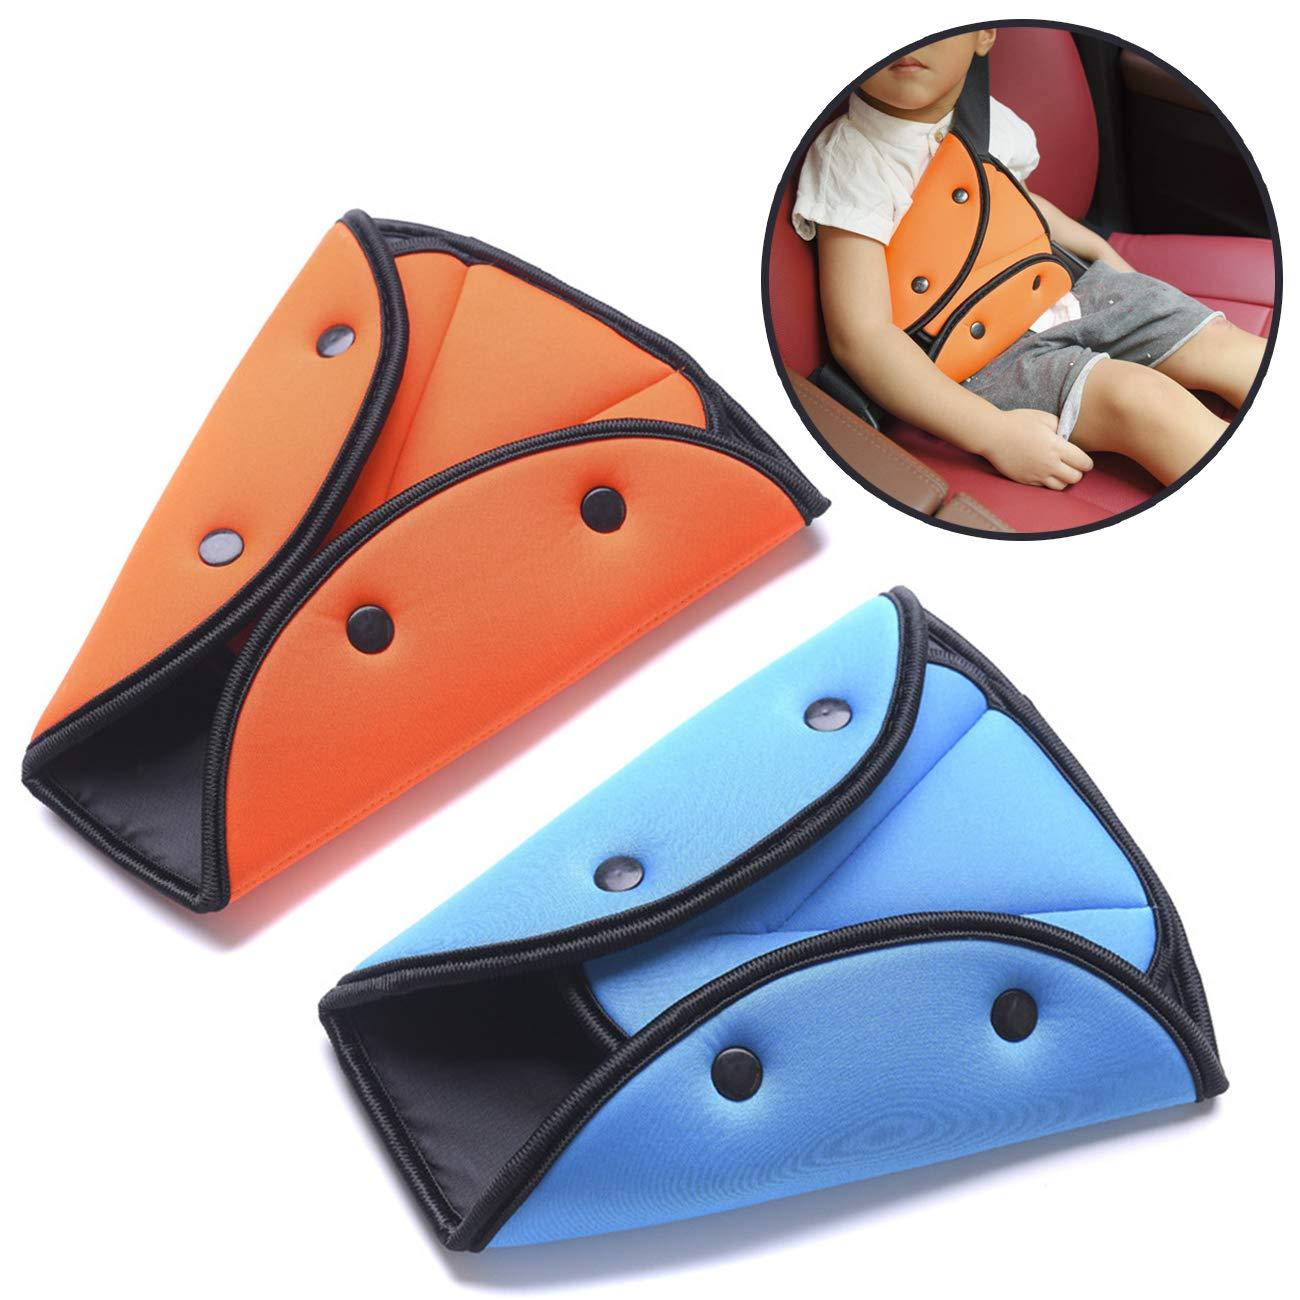 TinaWood [2-Pack] Seat Belt Adjuster for Kids, Seat Belt Positioner Seat Belt Safety Covers Seat Belts Protection (Orange & Blue)